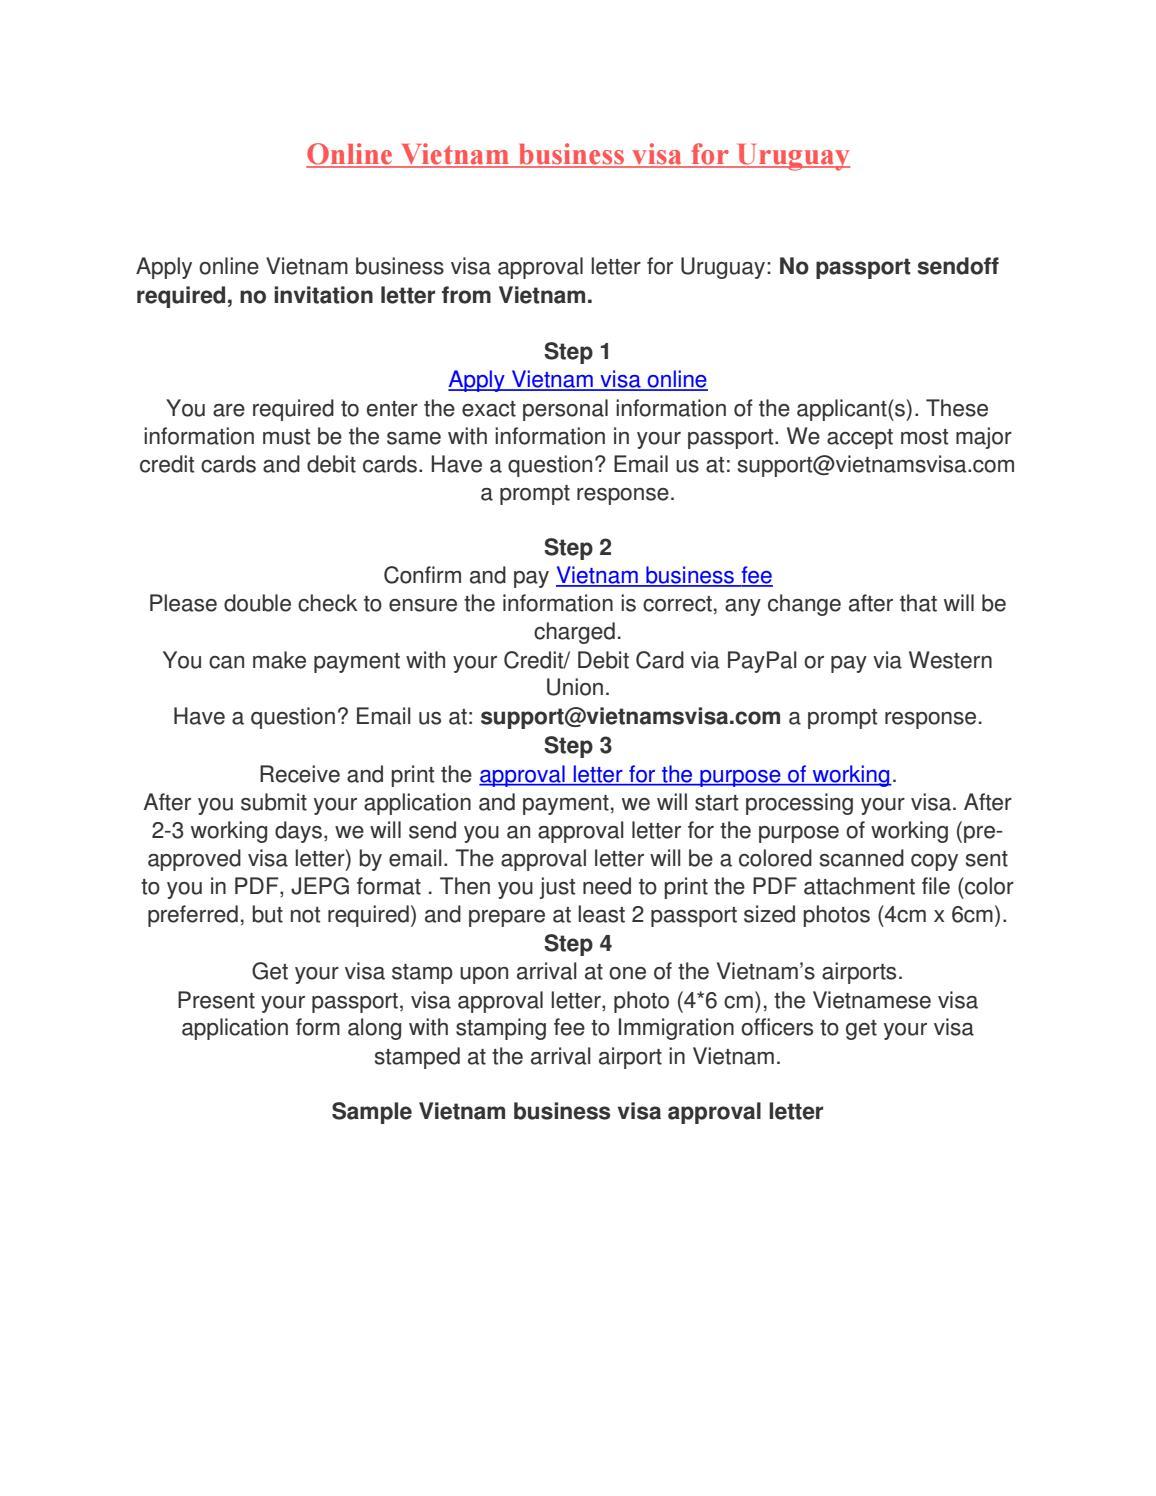 Online vietnam business visa for uruguay by vietnamsvisa online vietnam business visa for uruguay by vietnamsvisa vietnam visa on arrival vietnam visa online issuu spiritdancerdesigns Images